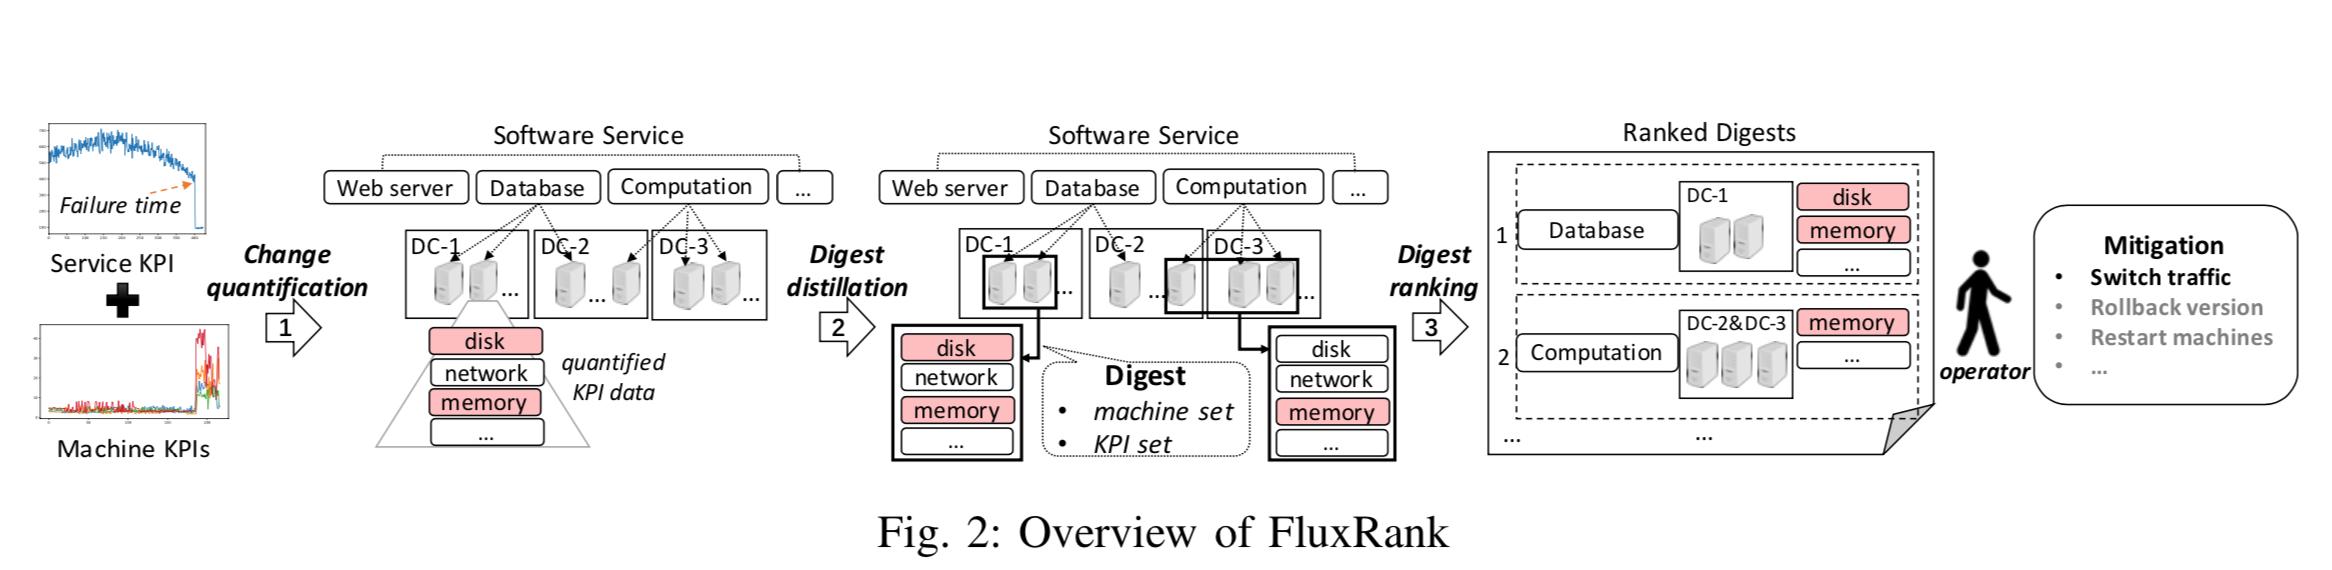 FluxRank_fig_2